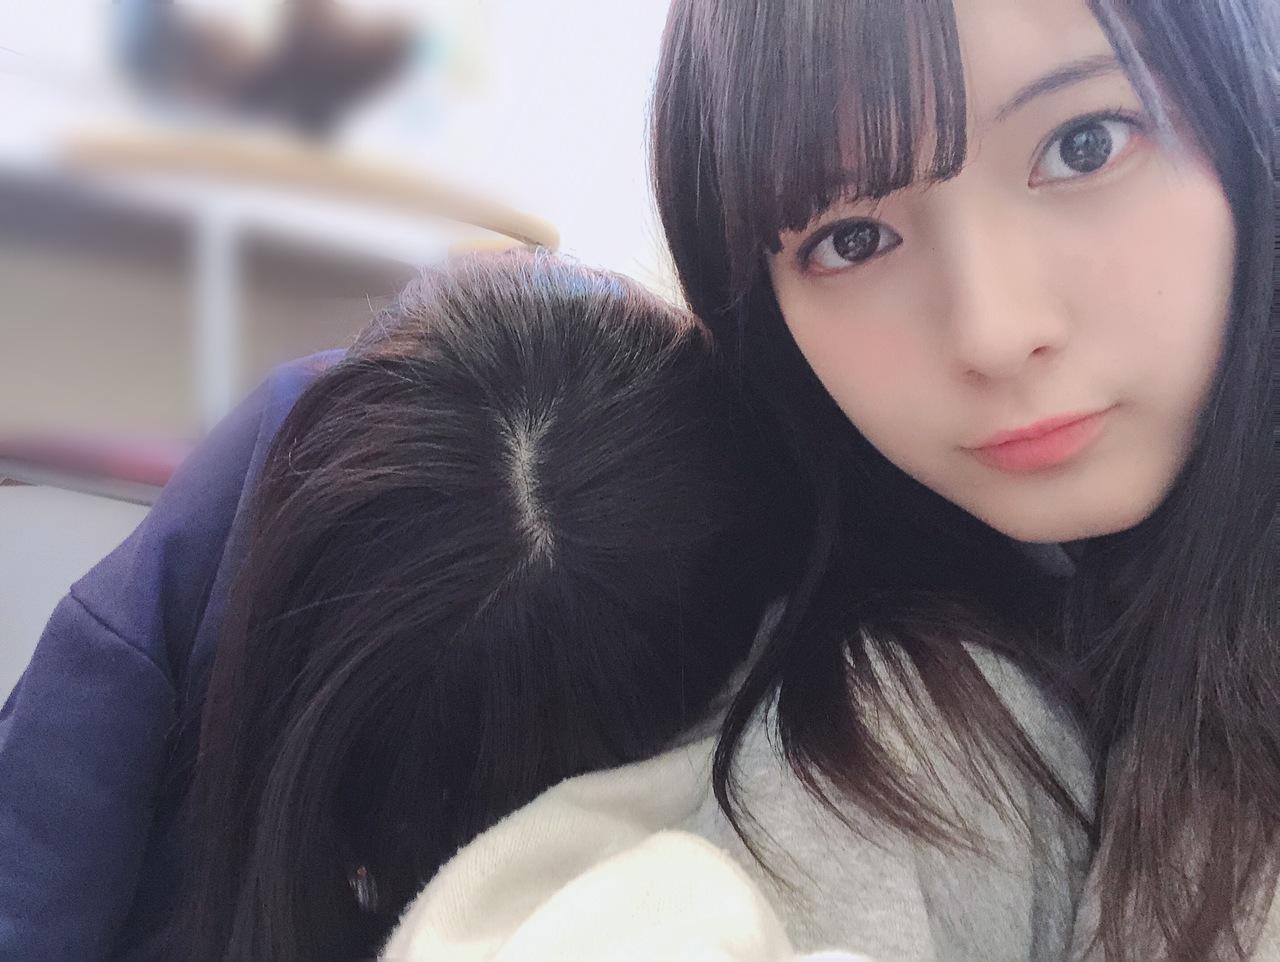 【欅坂46】武元唯衣応援スレ★1 YouTube動画>7本 ->画像>623枚